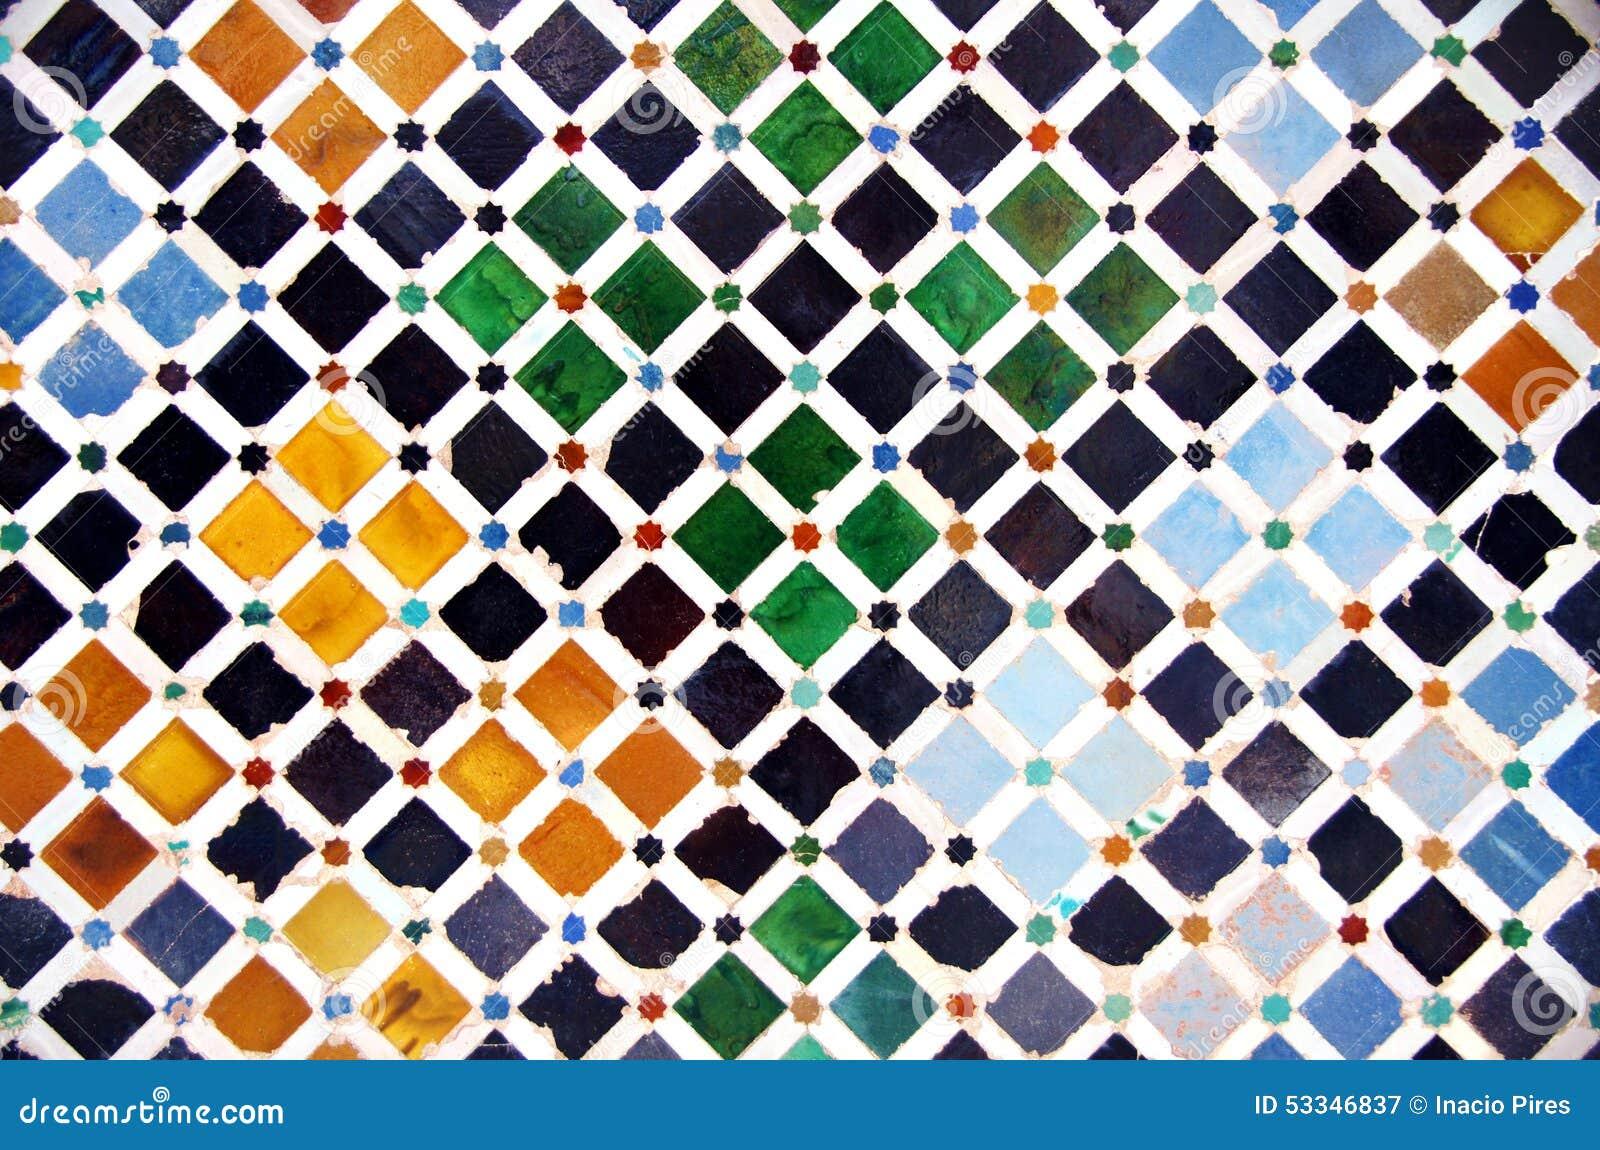 Tile decoration alhambra palace stock image image 53346837 for Alhambra decoration